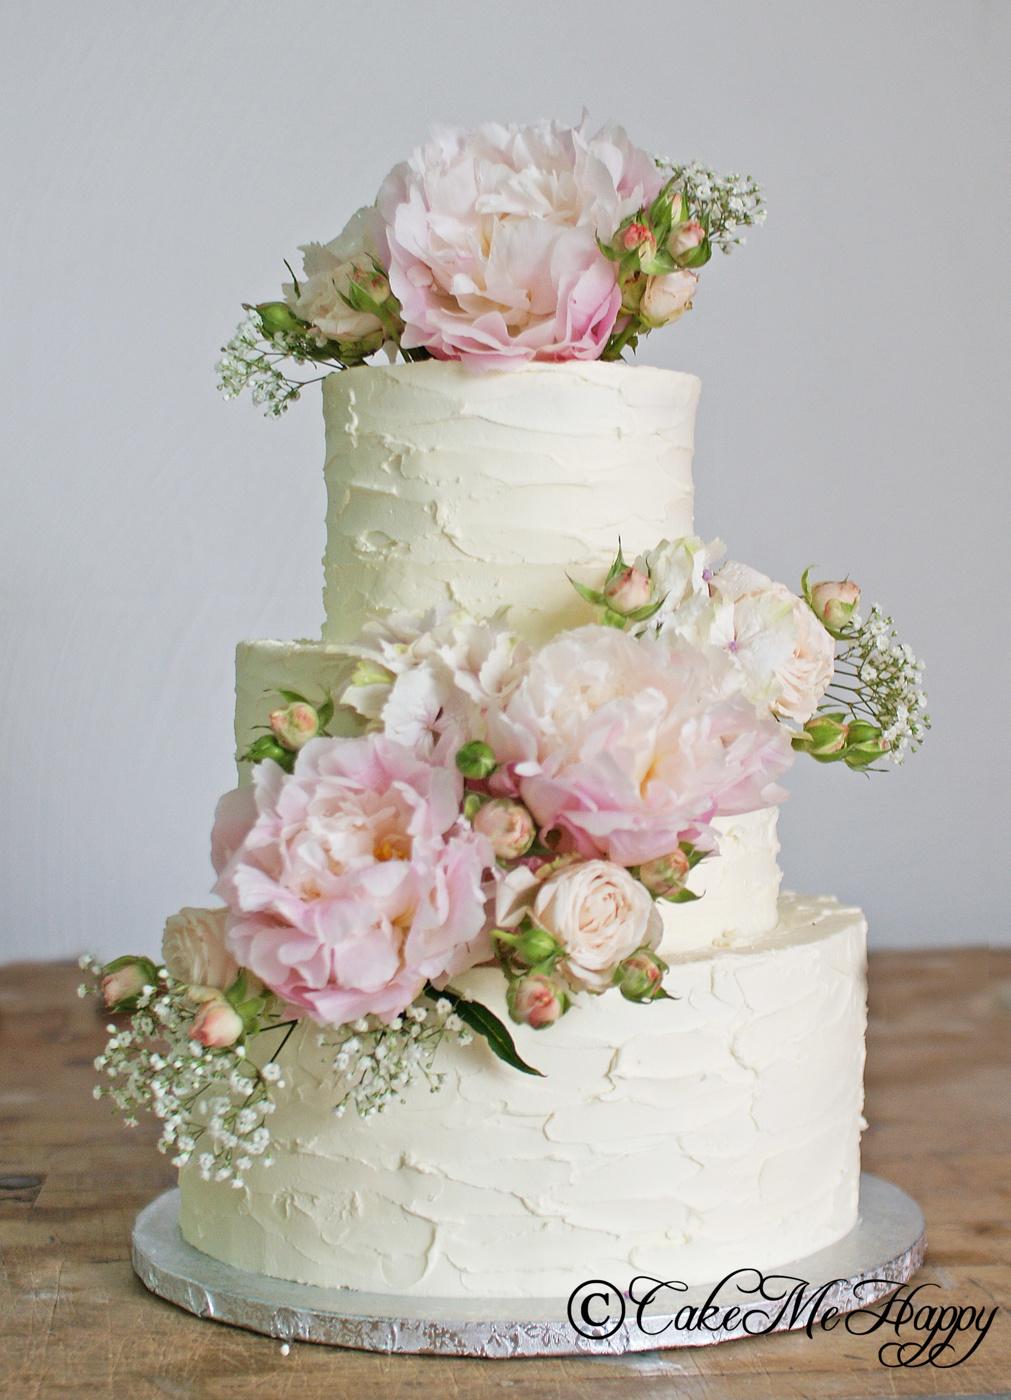 Cake Me Artinya : Cake Me Happy Brollopstankar